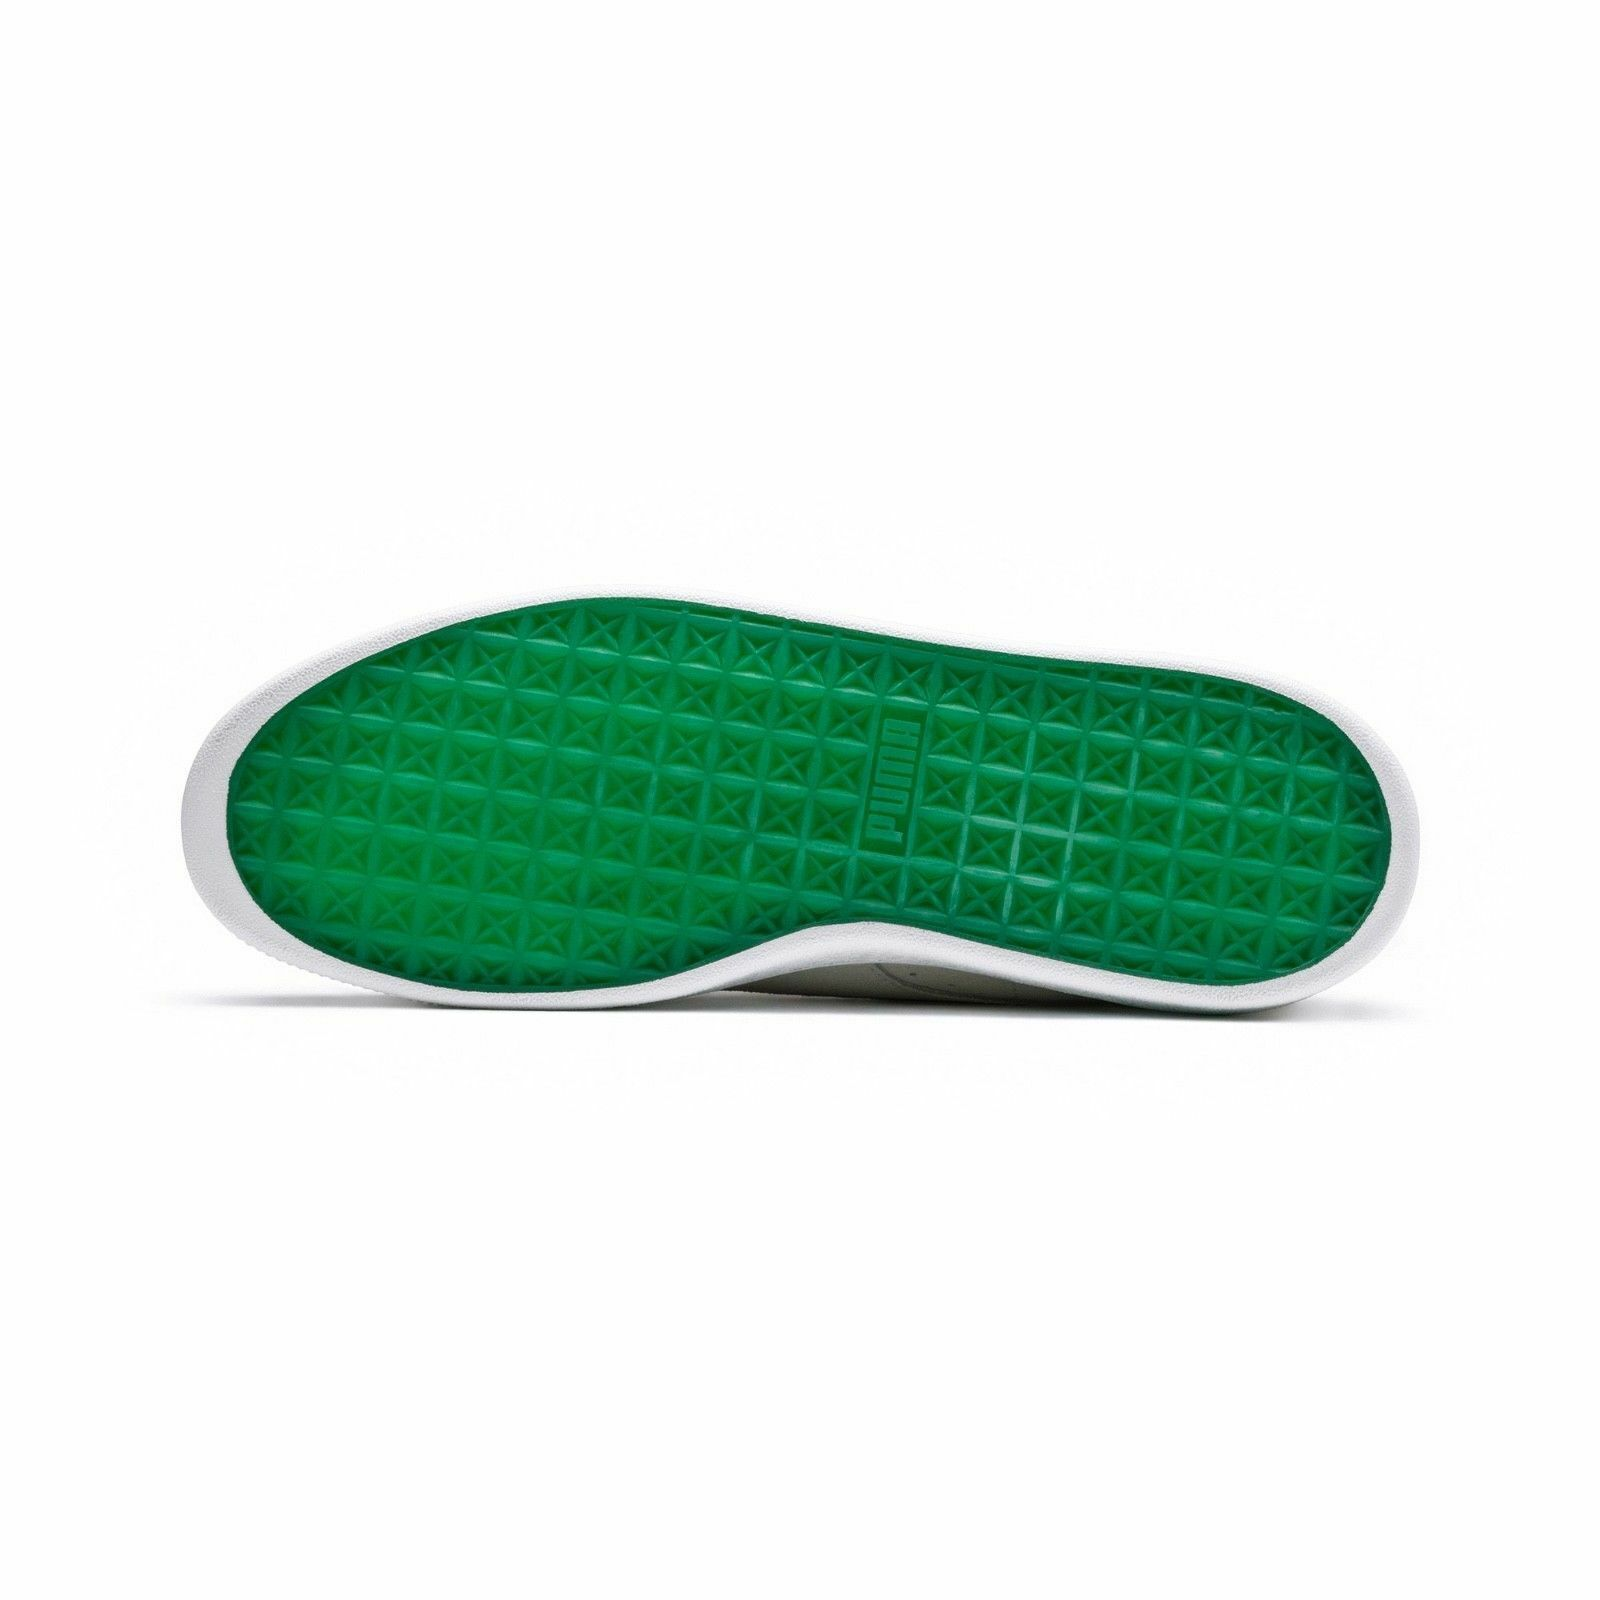 PUMA x Big Sean Mid Mid Sean Classic Suede Uomo Low Boot Sz 6C Whisper White 366300-01 New fcb864